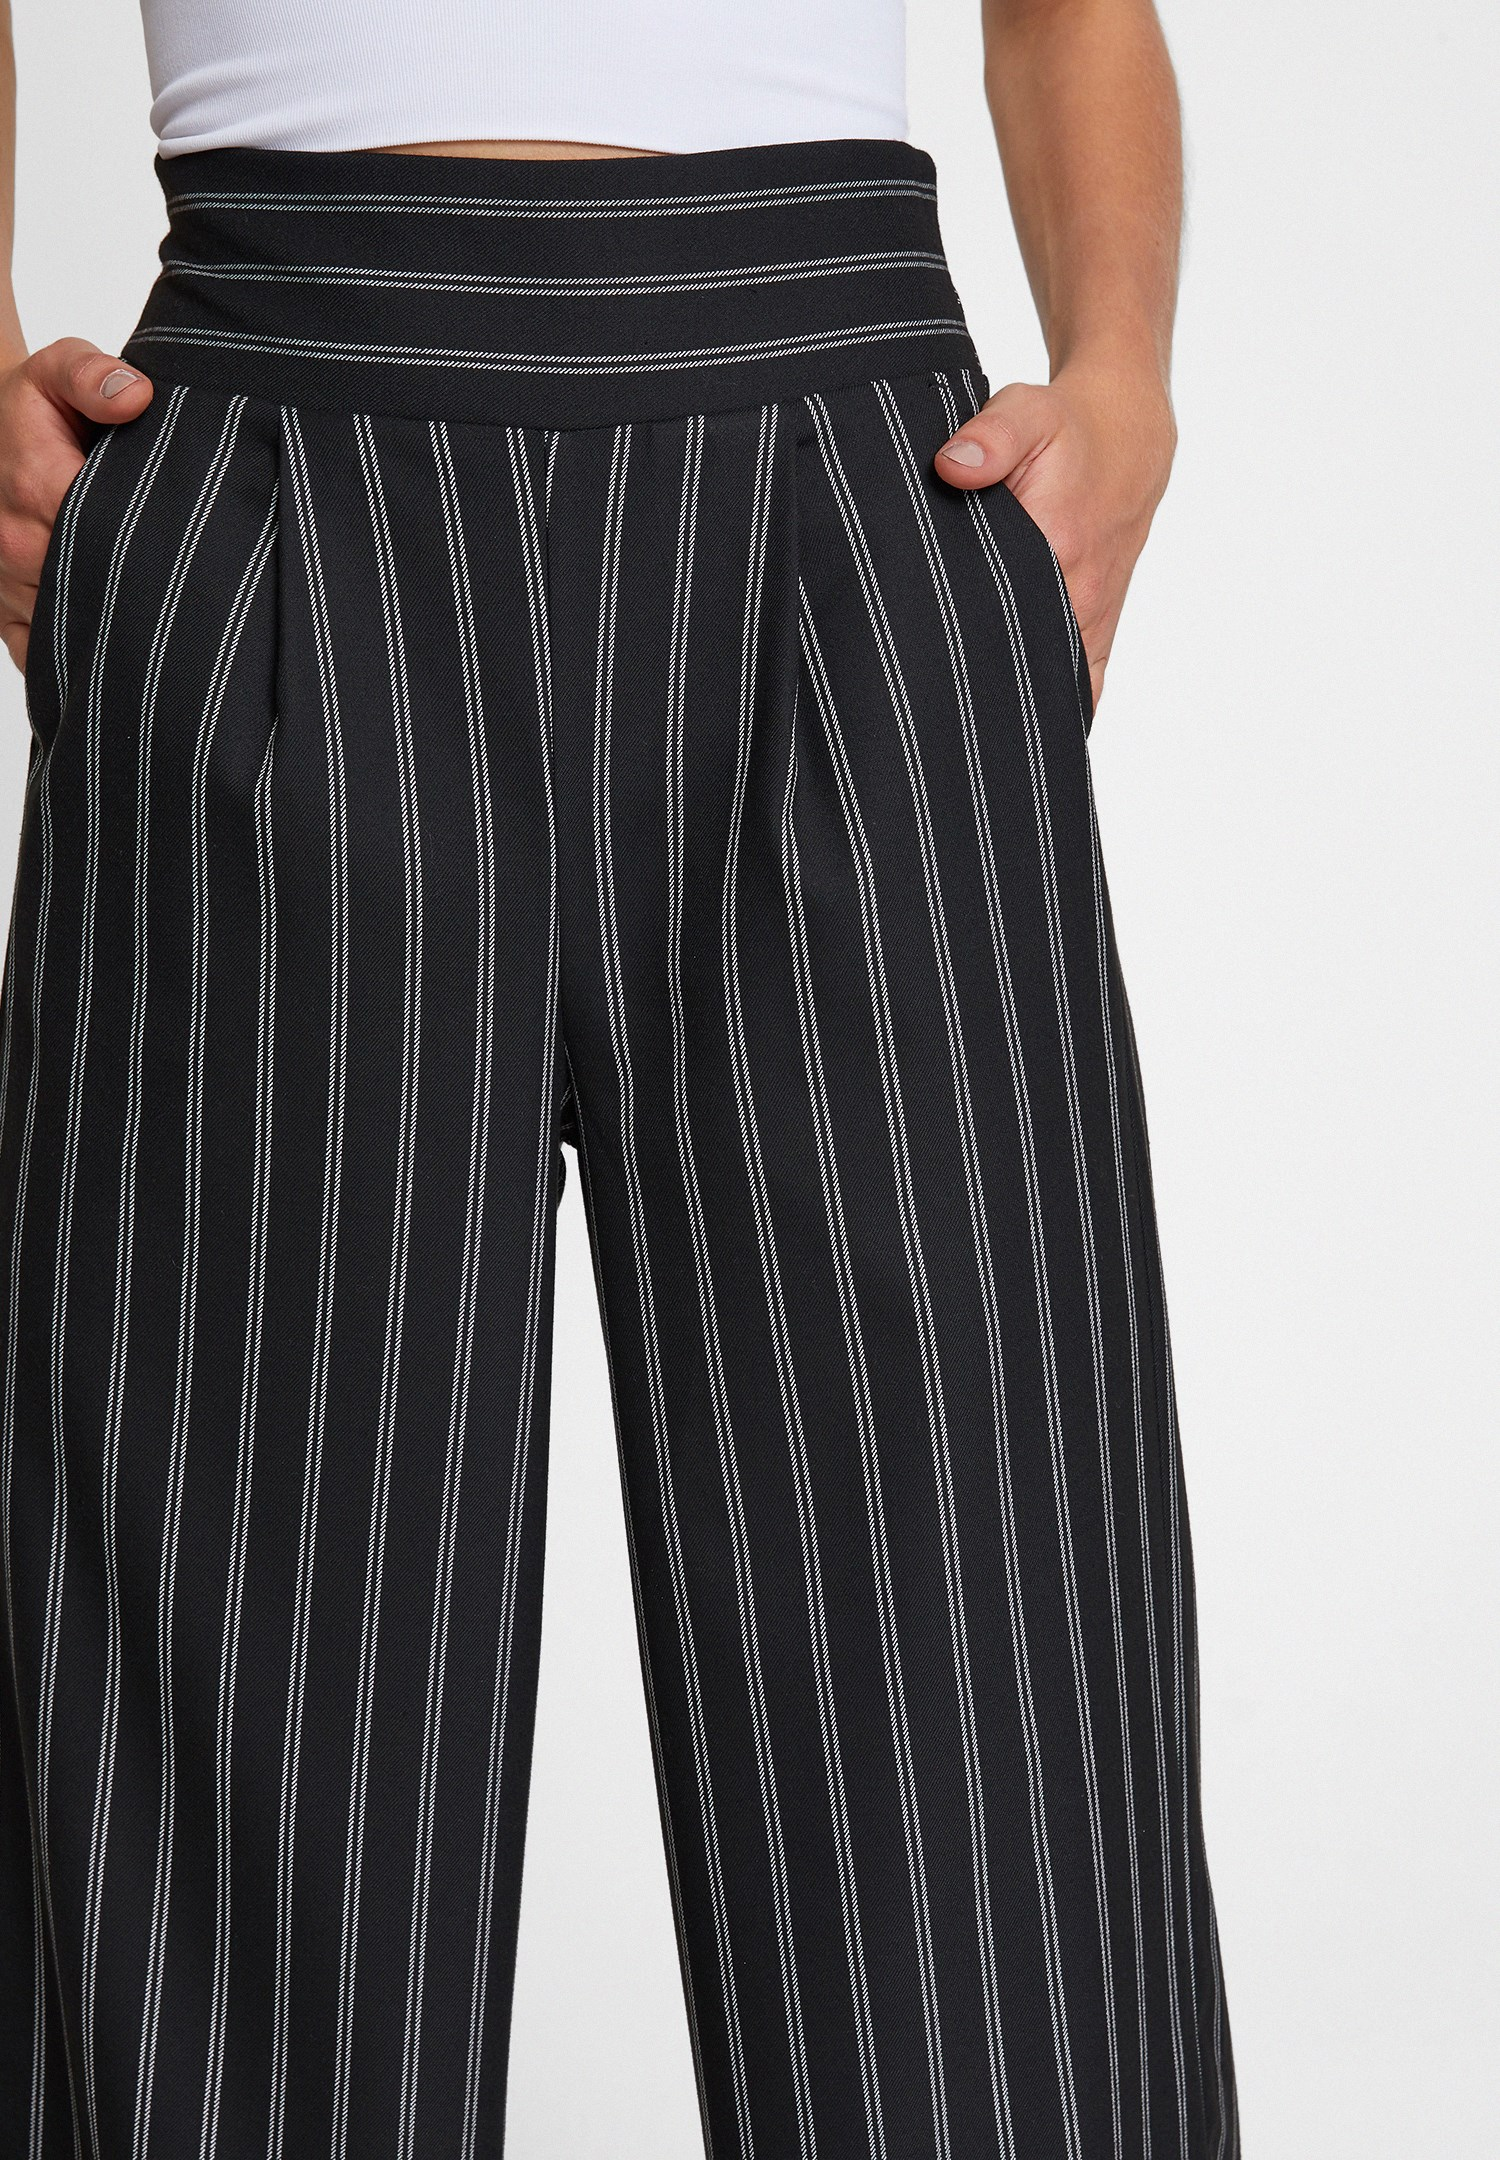 Bayan Siyah Çizgi Desen Detaylı Bol Pantolon